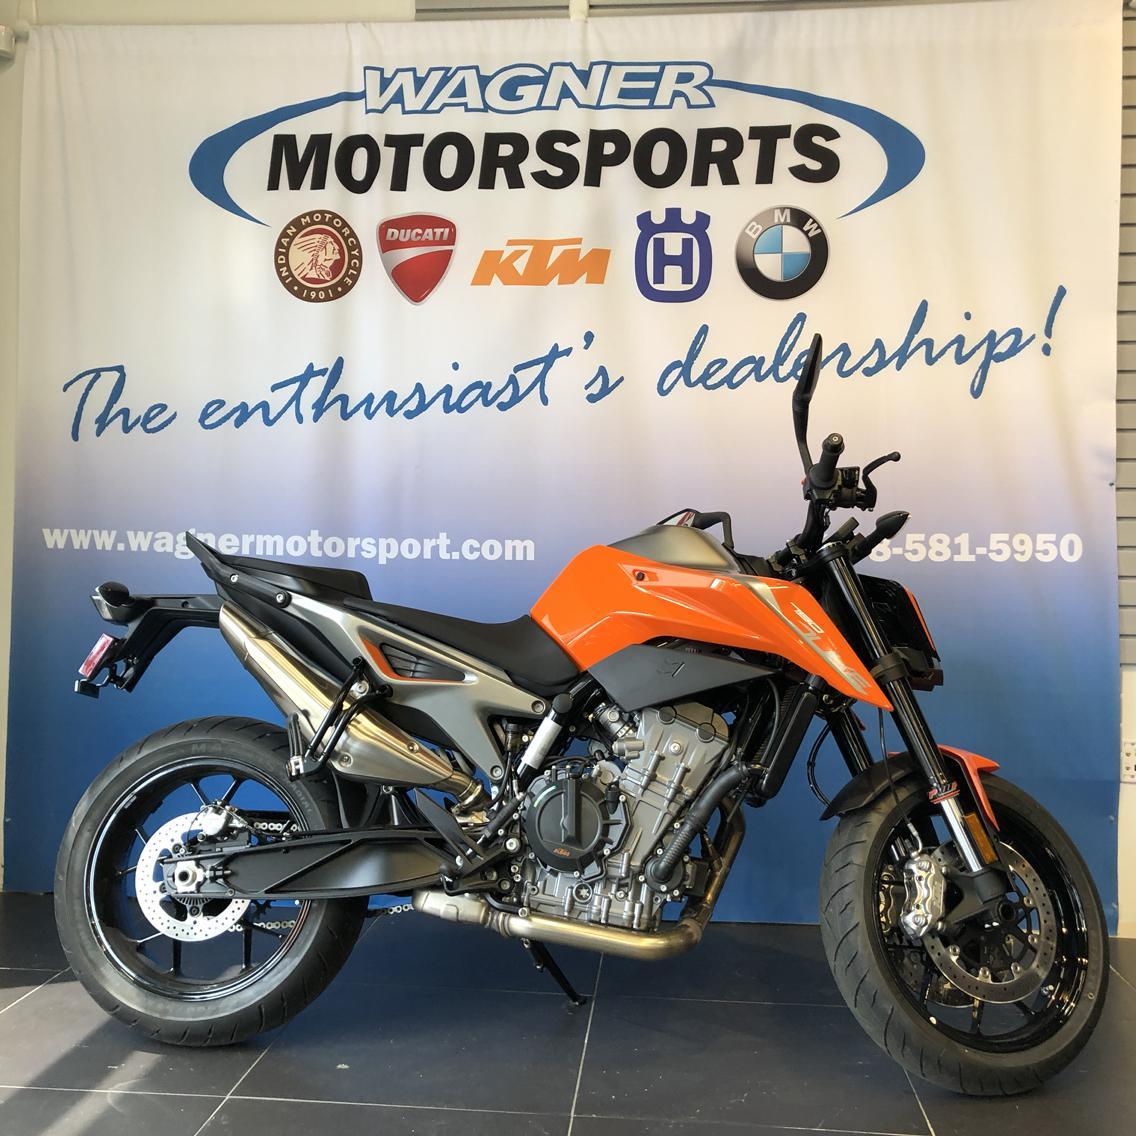 2019 KTM 790 Duke for sale in Worcester, MA   Wagner